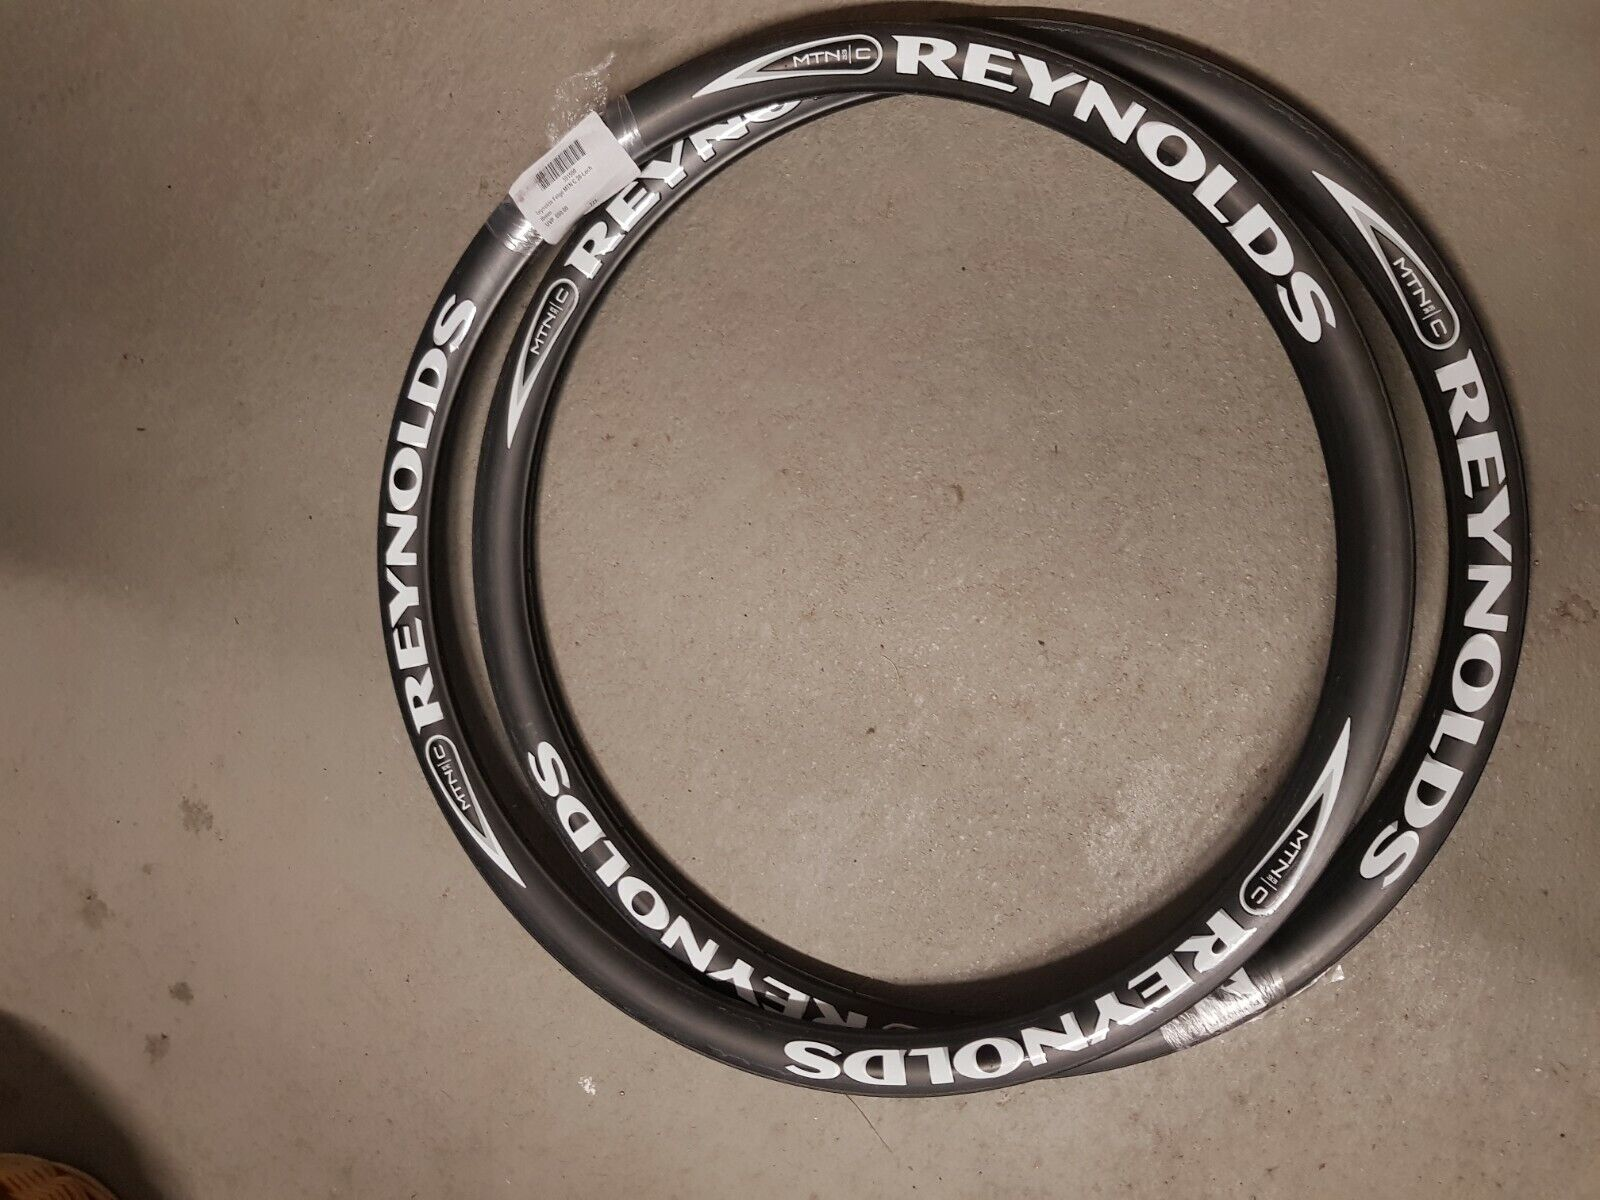 Reynolds MTB carbon MTN 33c llanta 26  nuevo sin usar